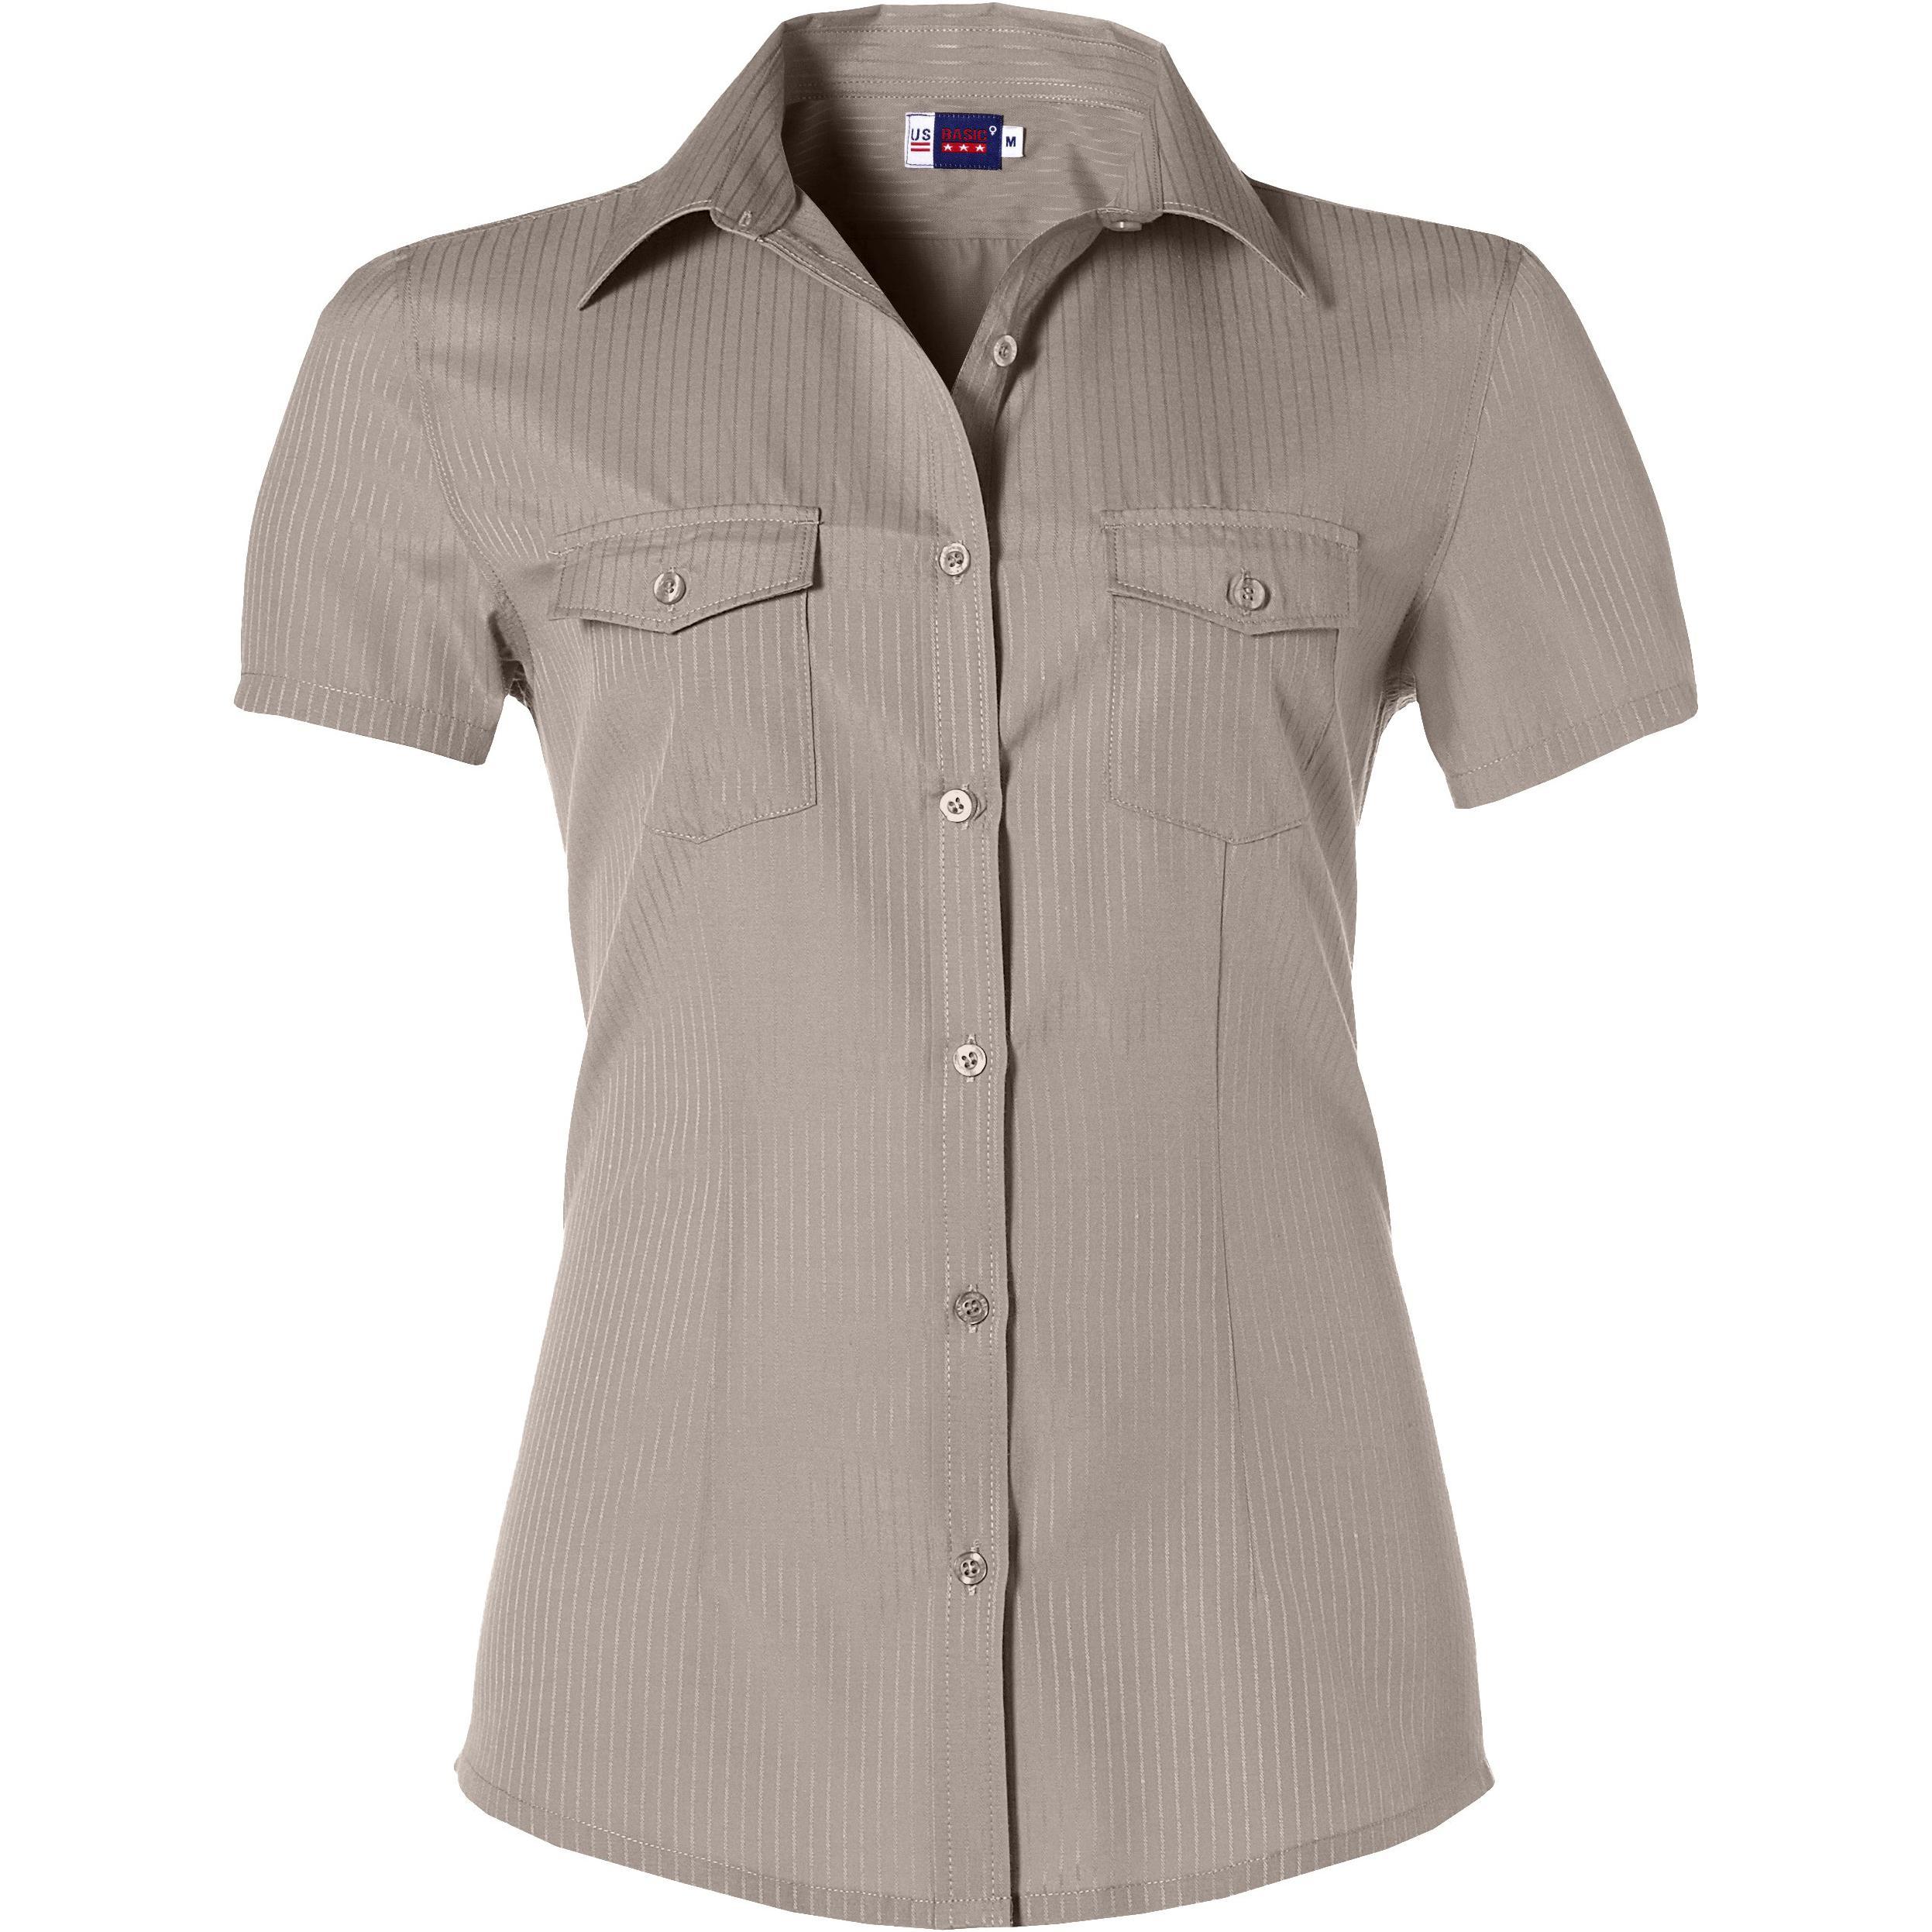 Ladies Short Sleeve Bayport Shirt - Khaki Only